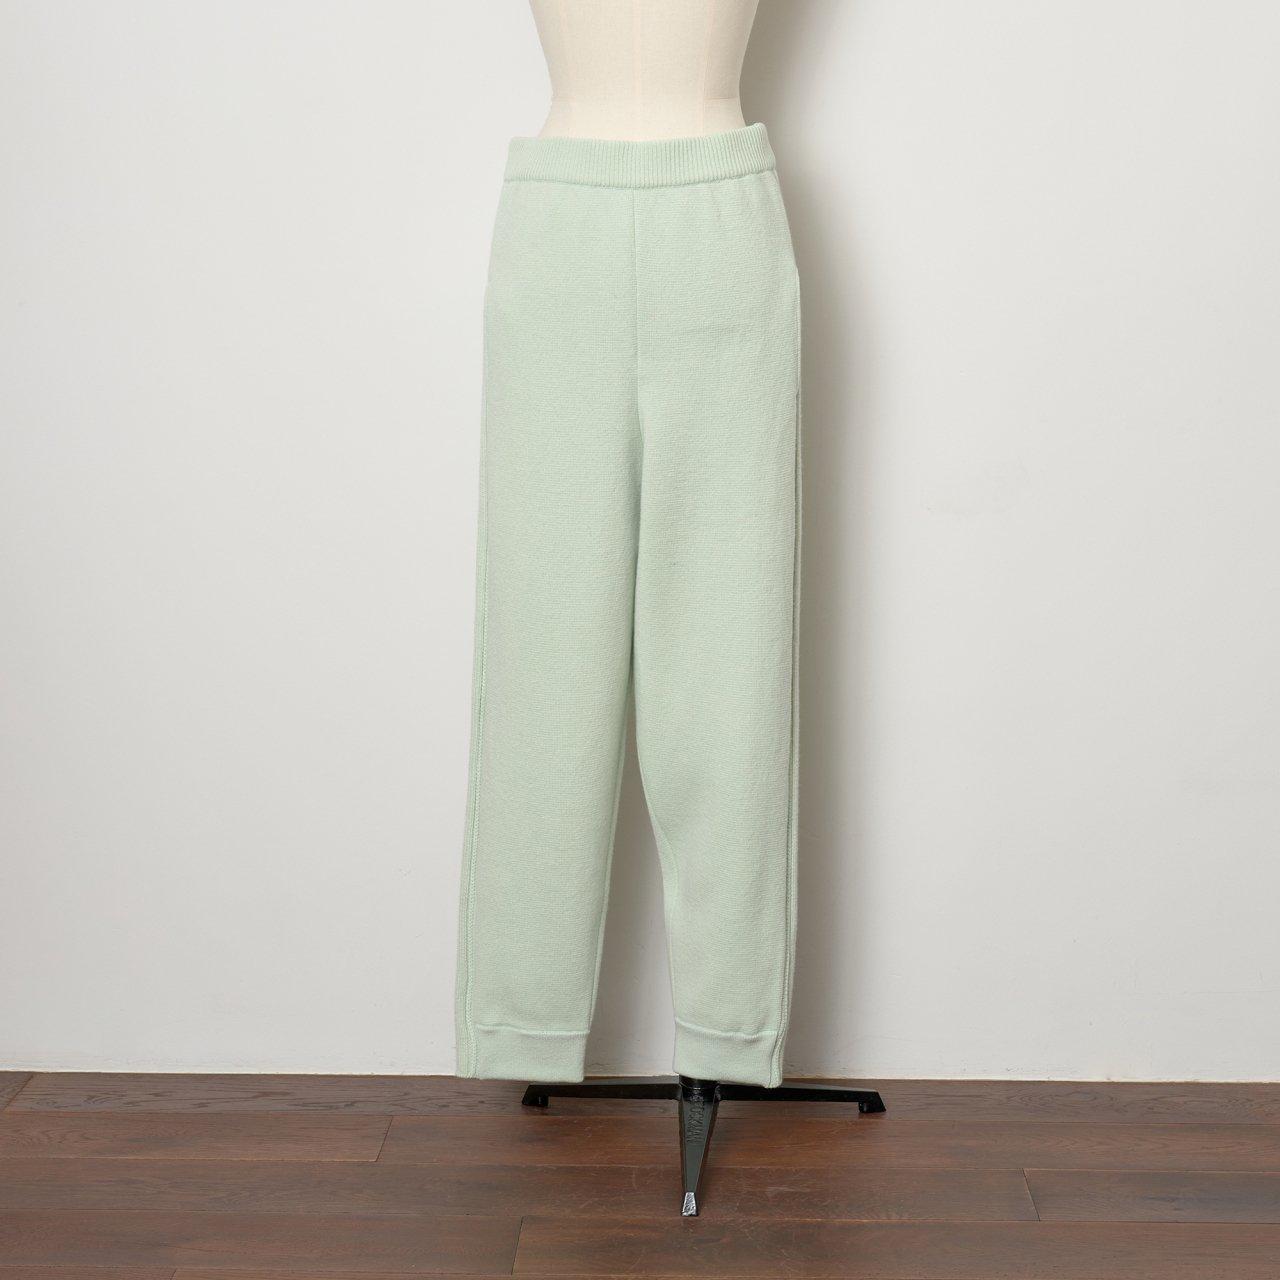 pelleq<BR>Cozy trousers<BR>mintgreen